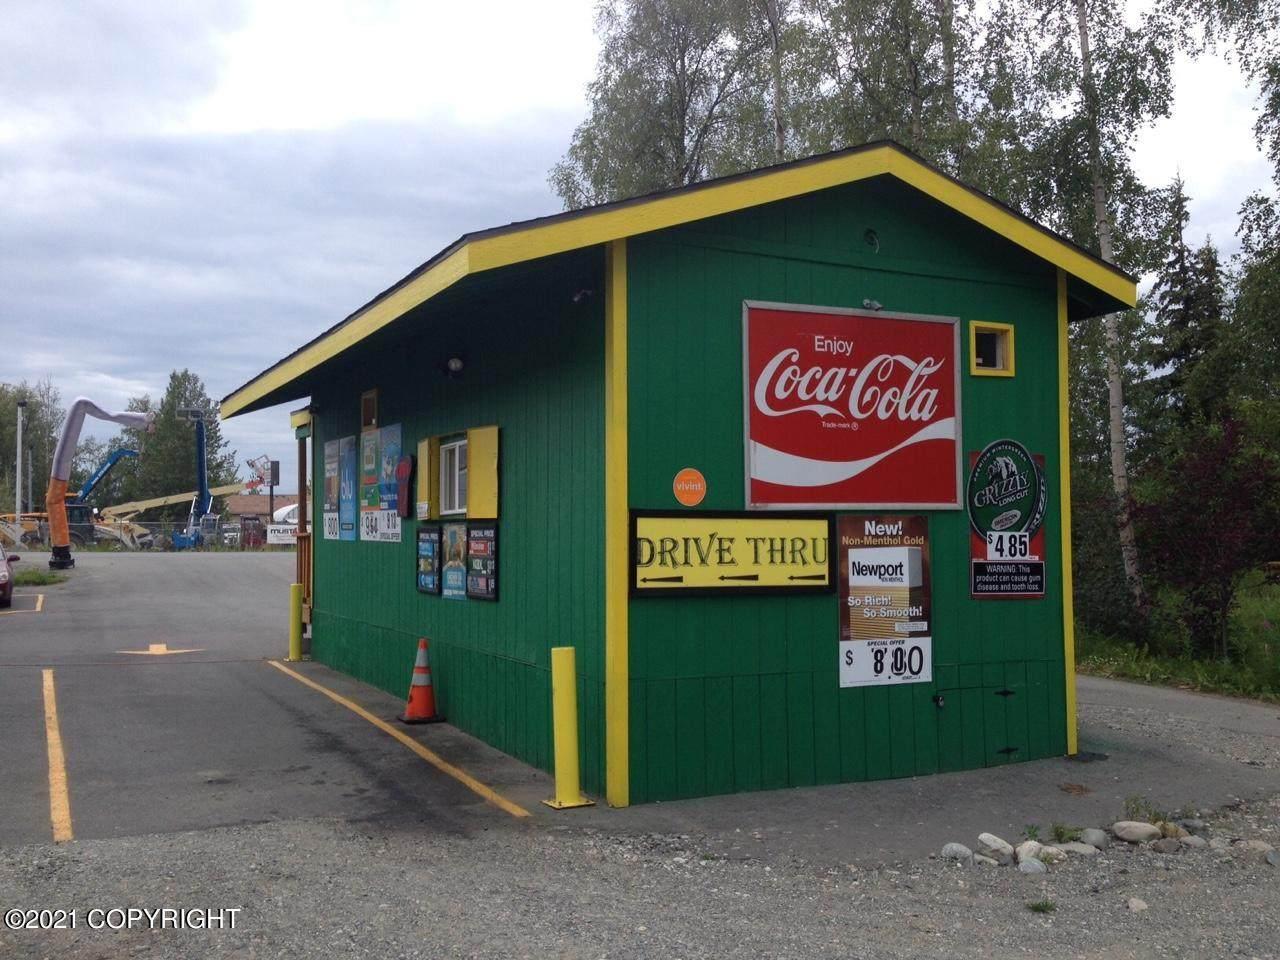 https://bt-photos.global.ssl.fastly.net/alaska/orig_boomver_1_21-13494-2.jpg